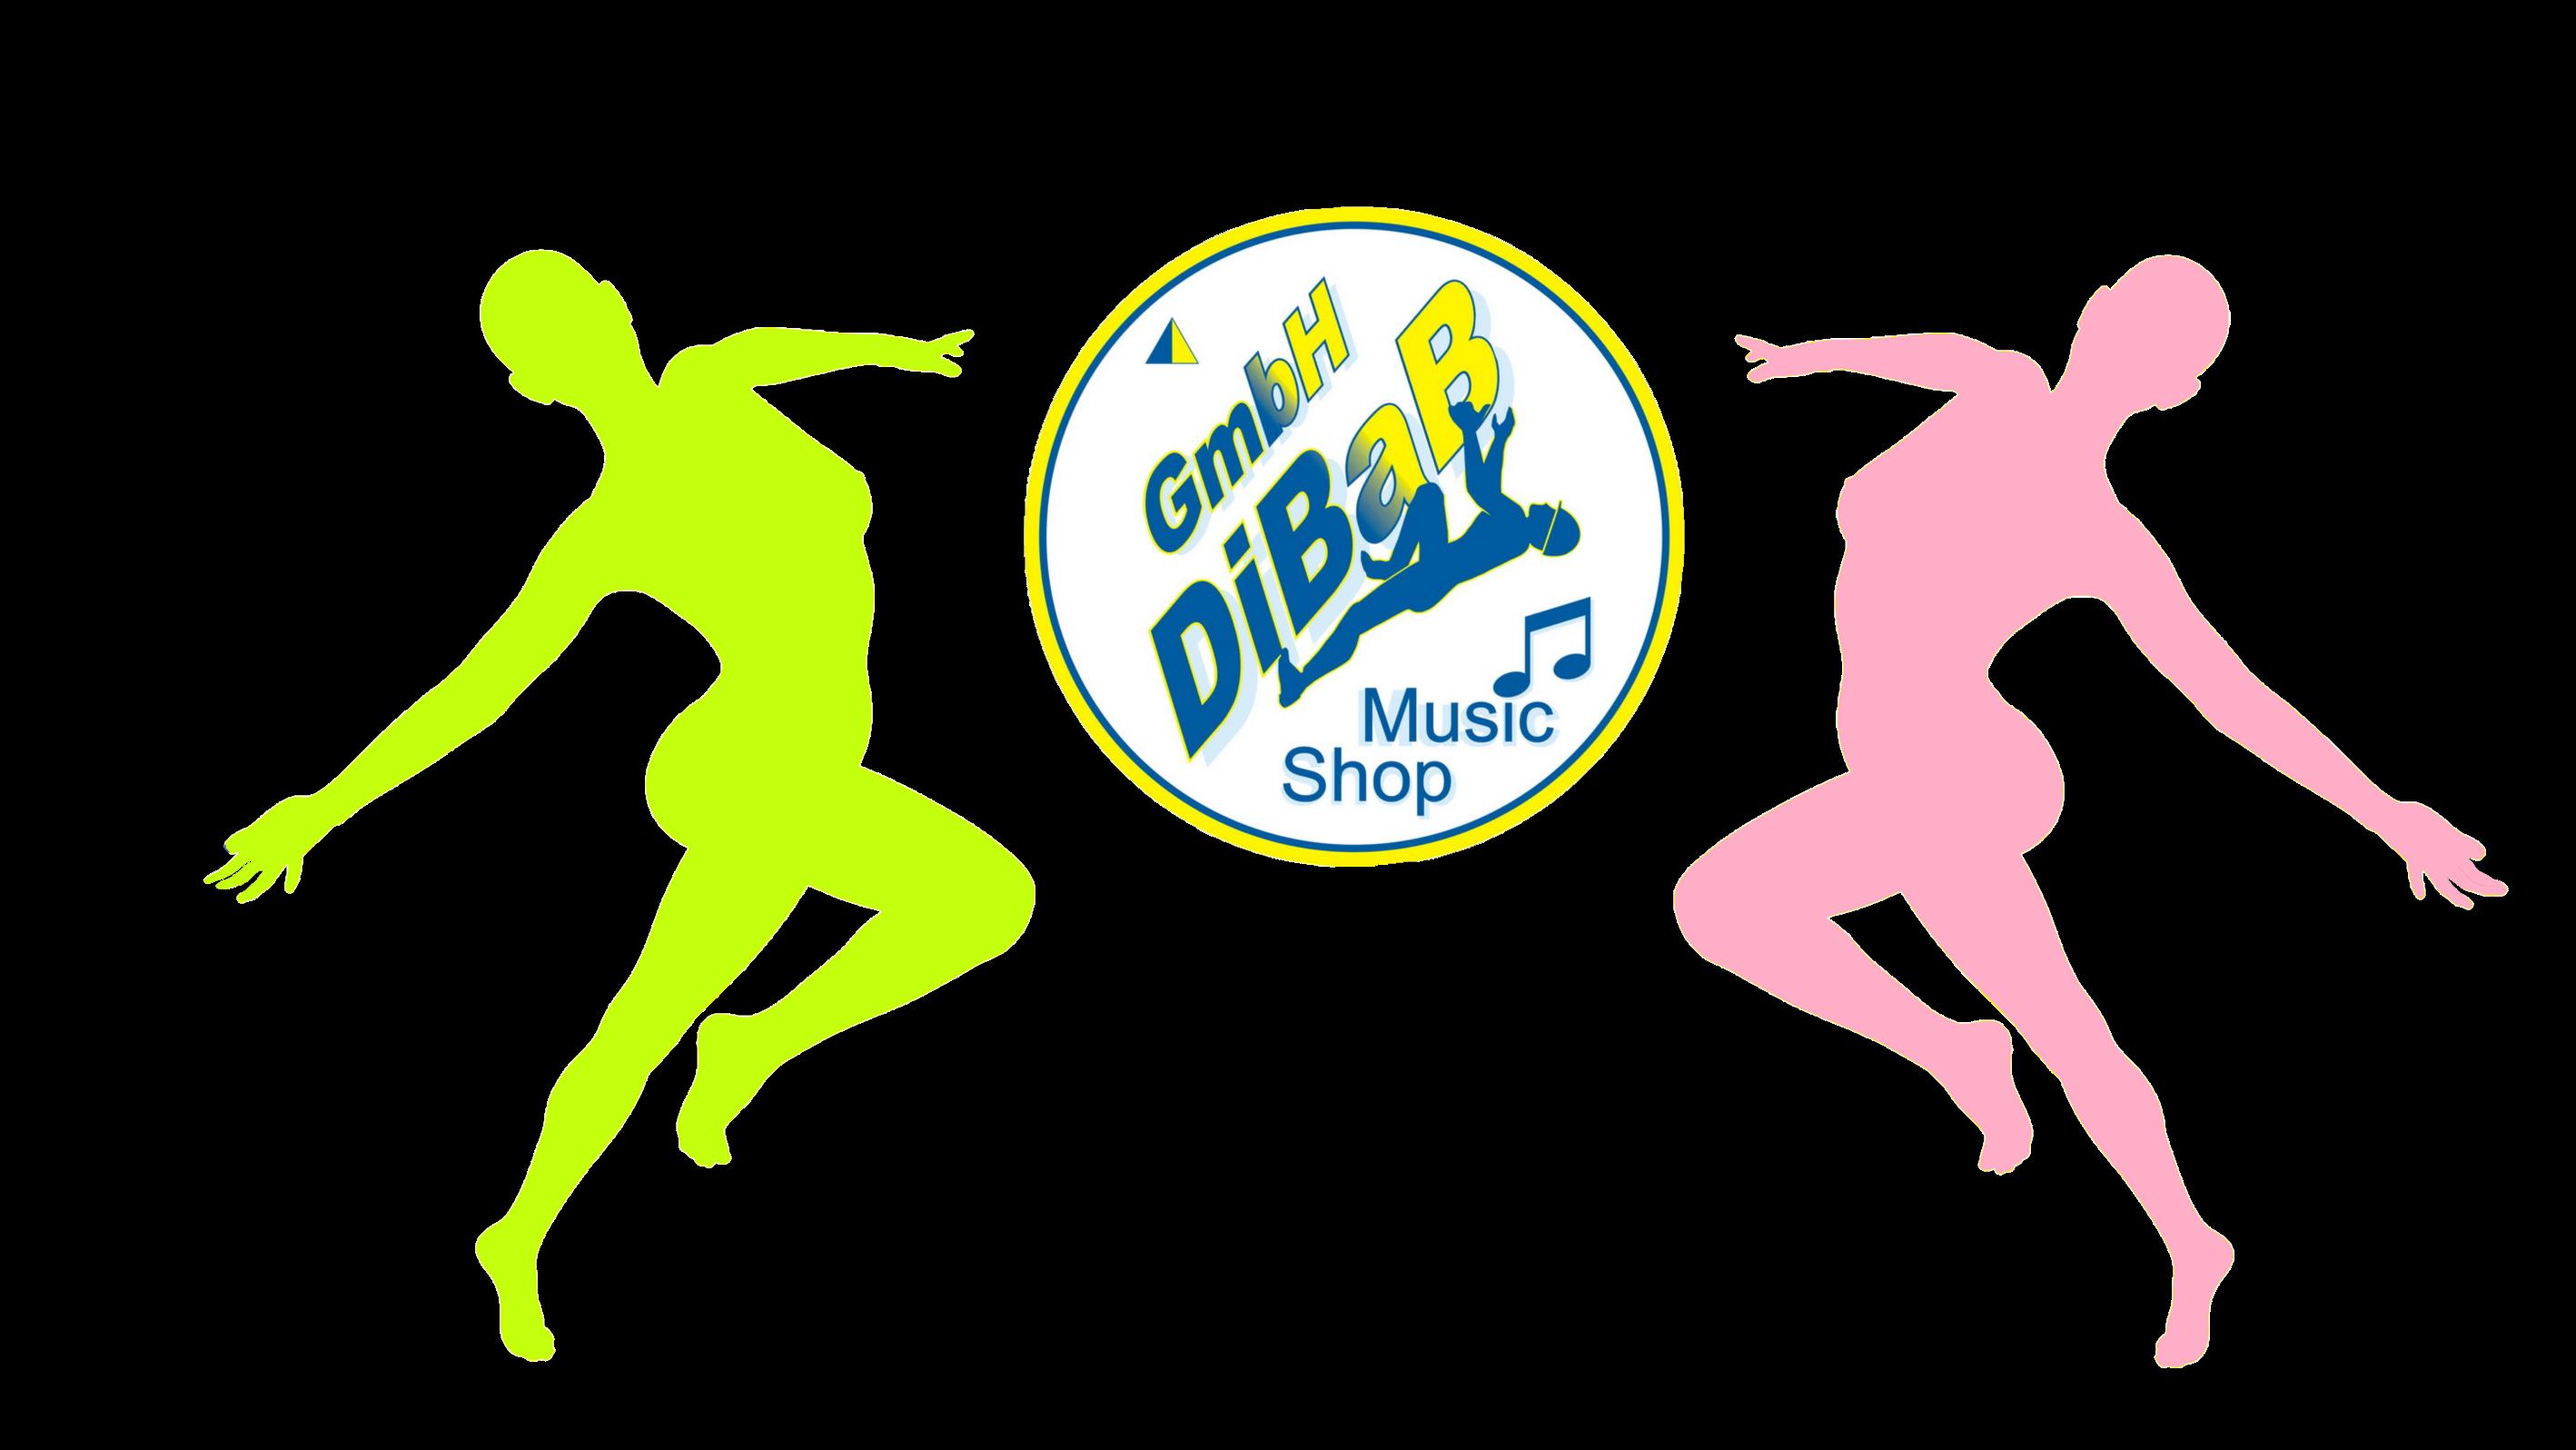 #Noten Verkauf #MP3 kostenlos #DiBaB Music #André Hüller #Pop #Jazz #Chor #Rock #Latin #Funk #Piano